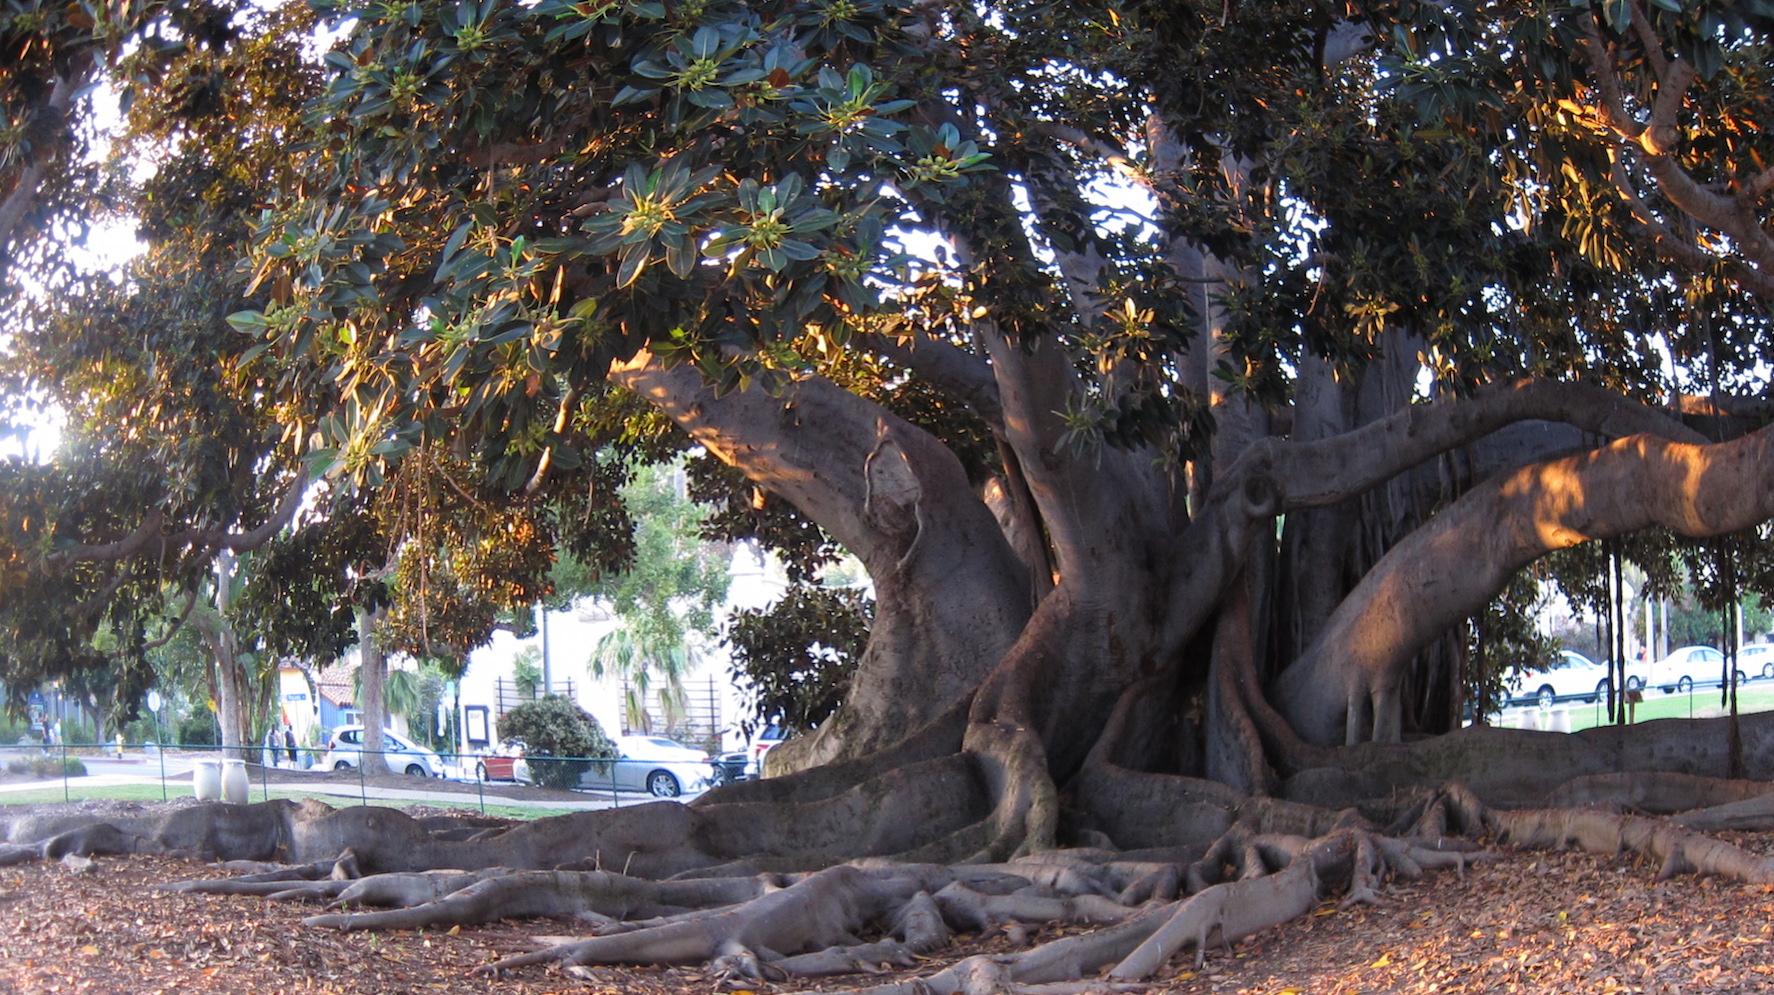 Balboa Park S Moreton Bay Fig How To Keep The Love San